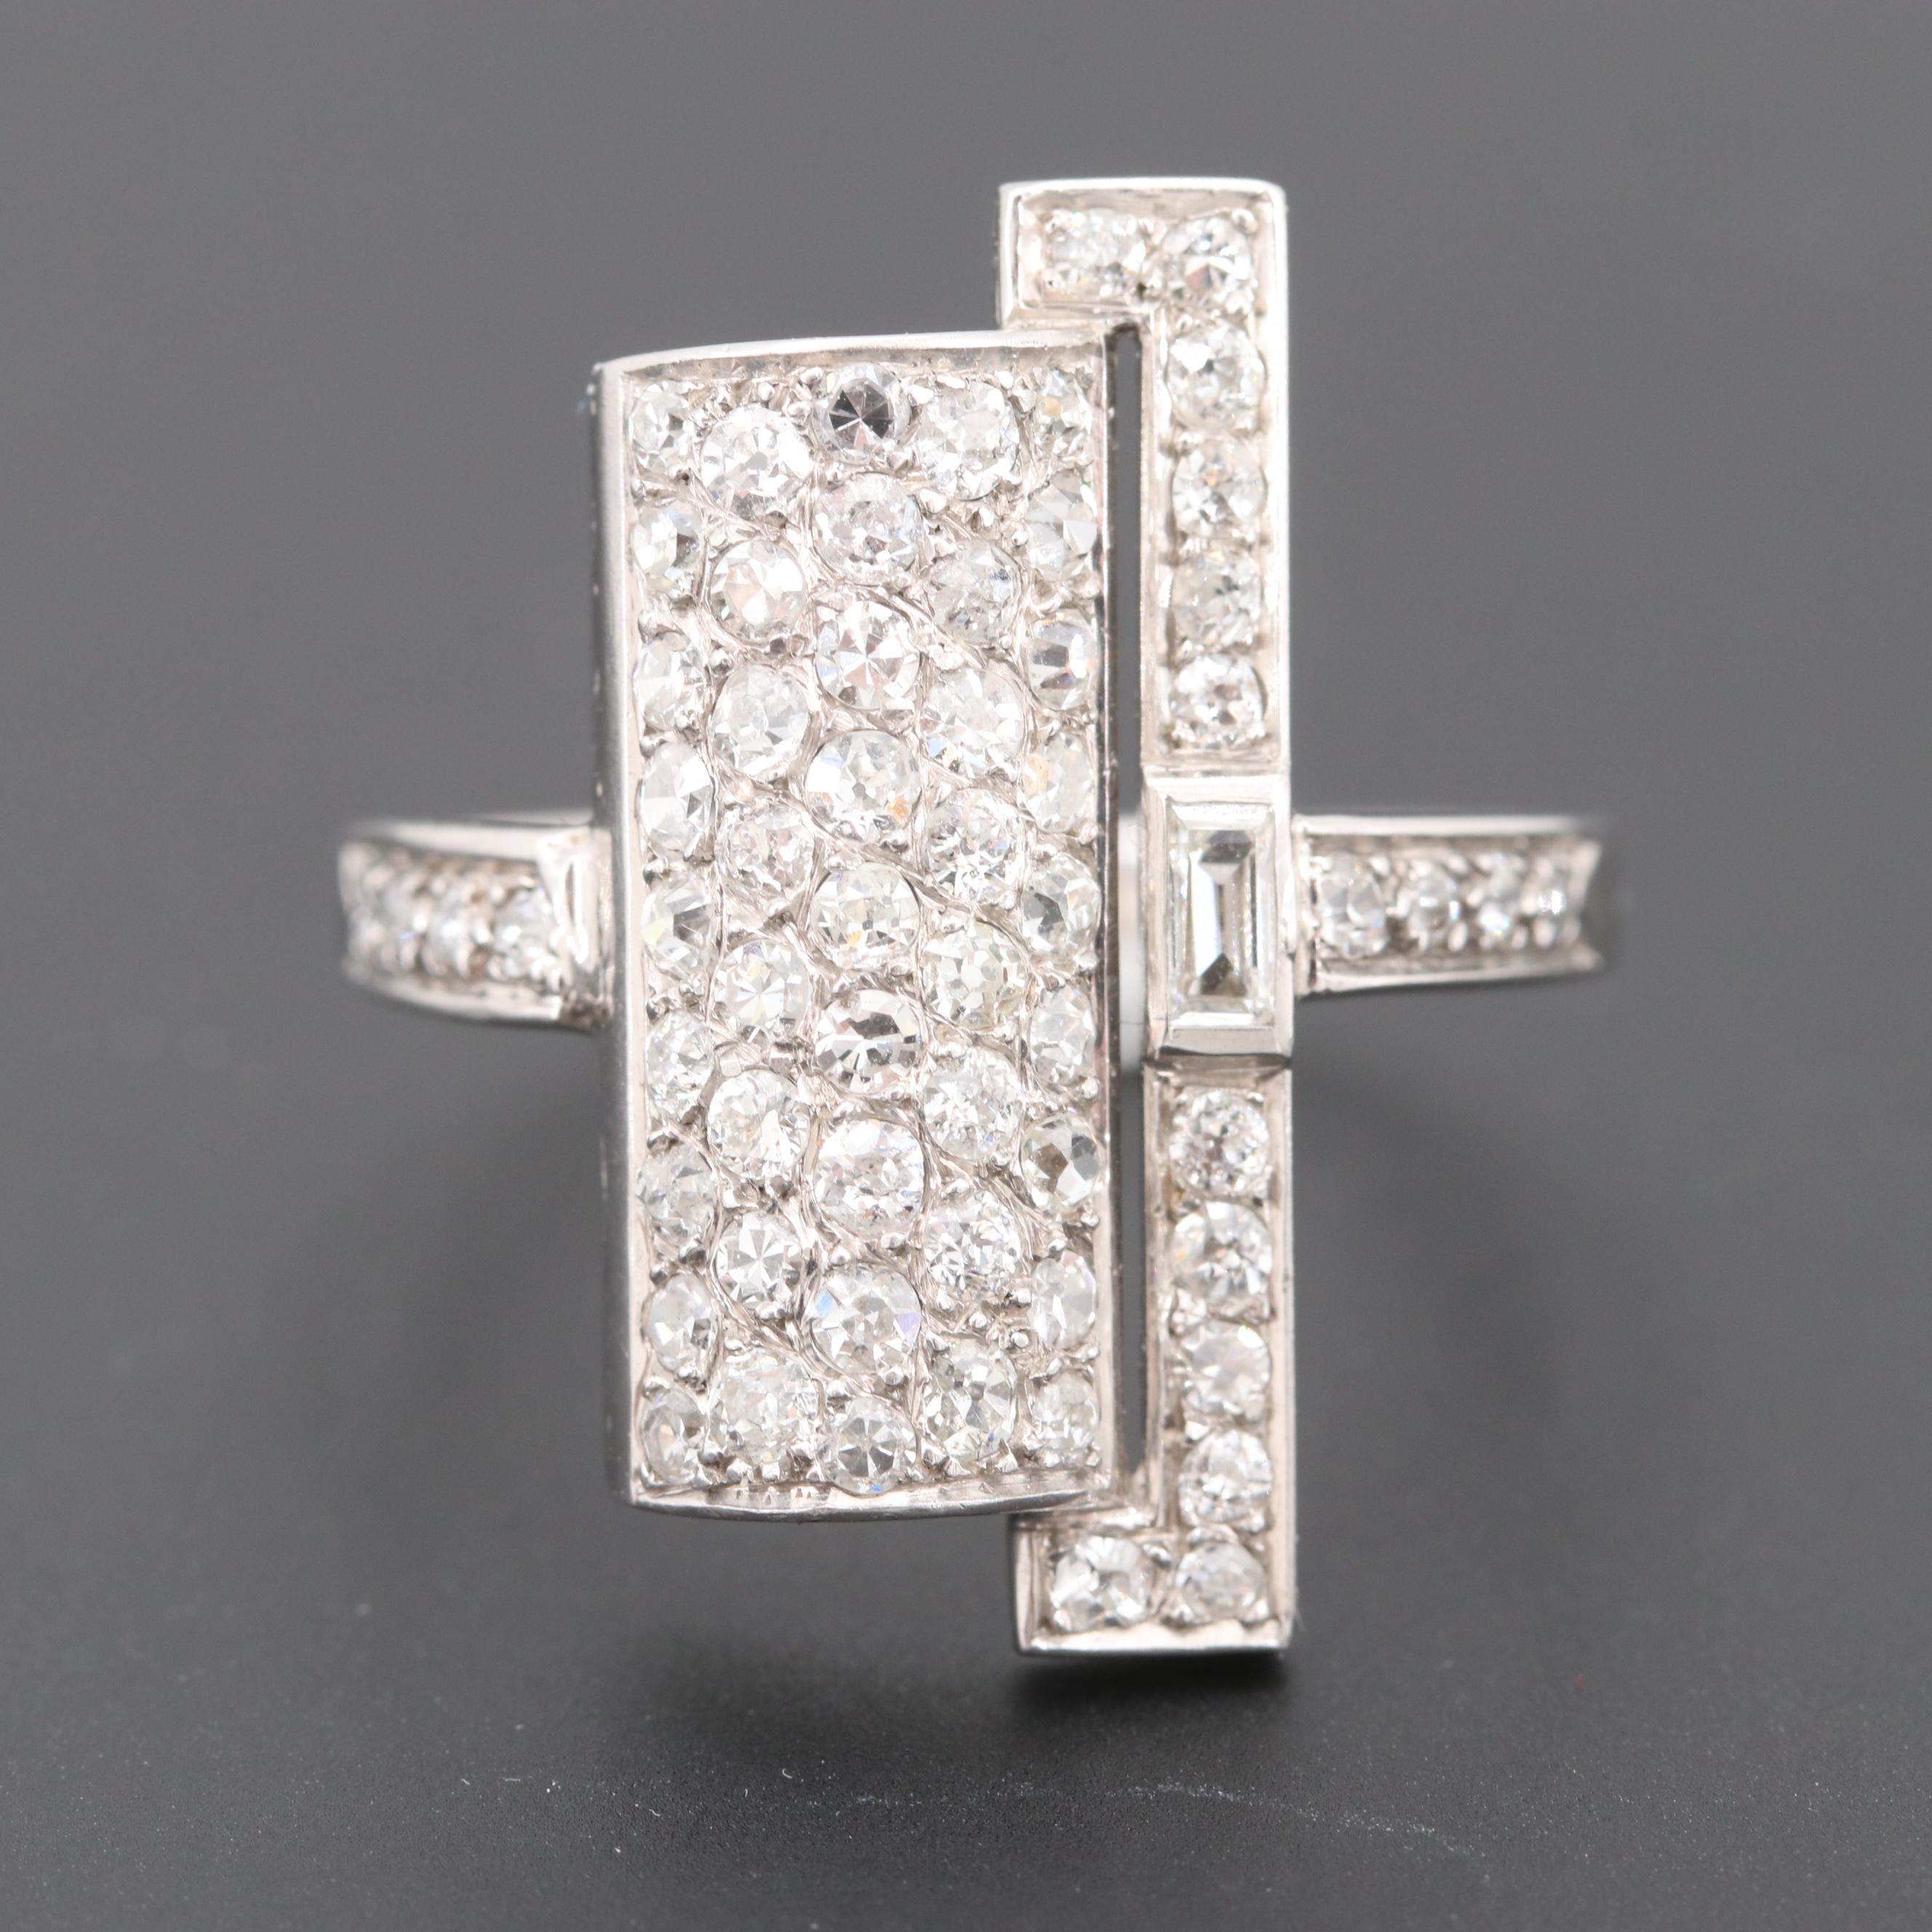 18K White Gold 1.35 CTW French Art Deco Diamond Pavé Ring